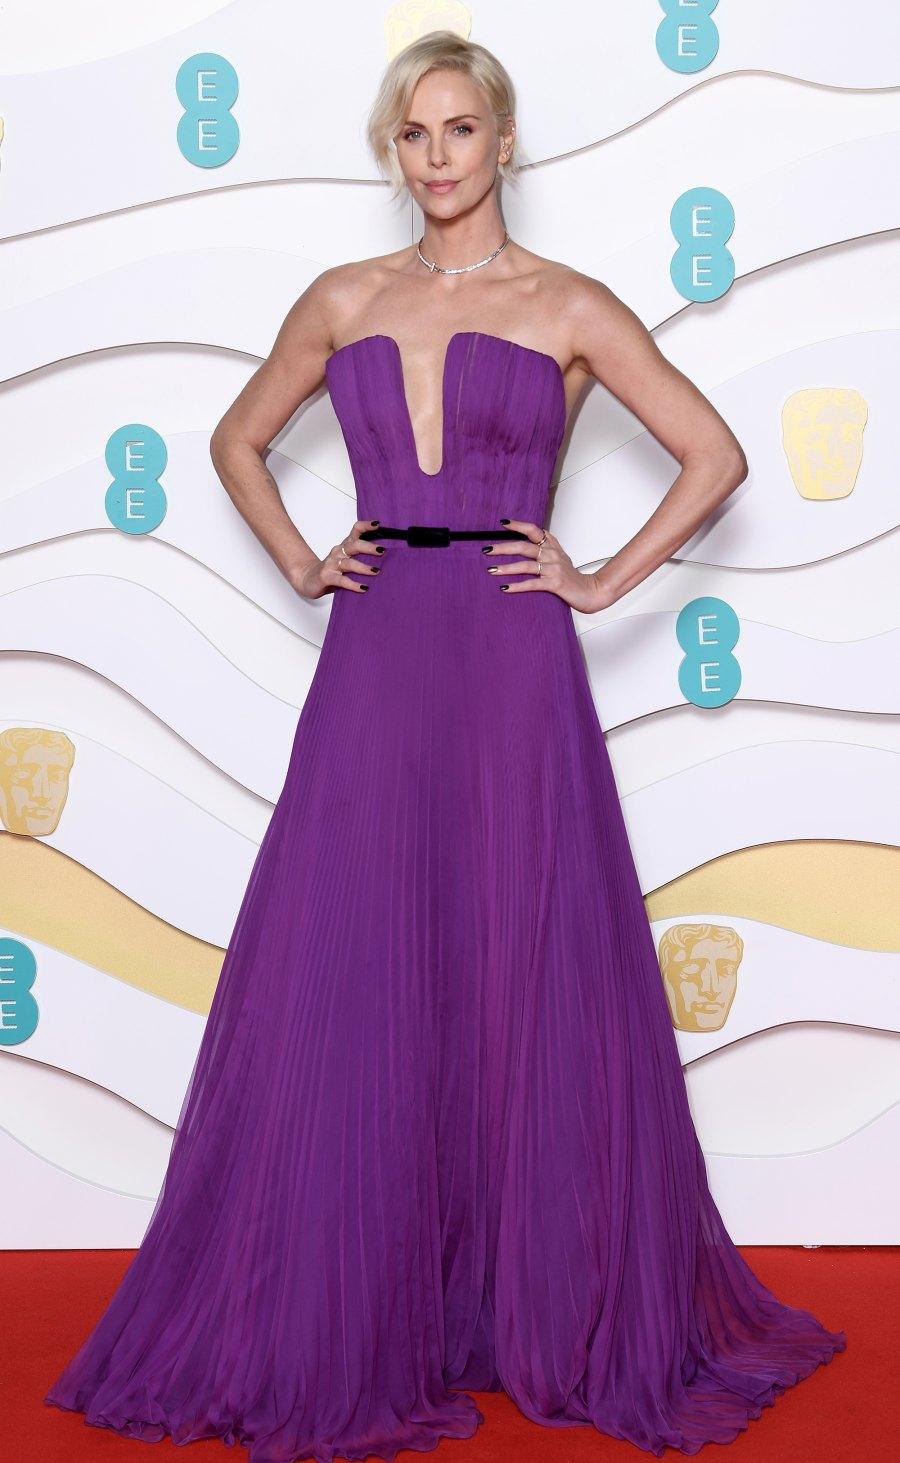 BAFTA Awards 2020 - Charlize Theron